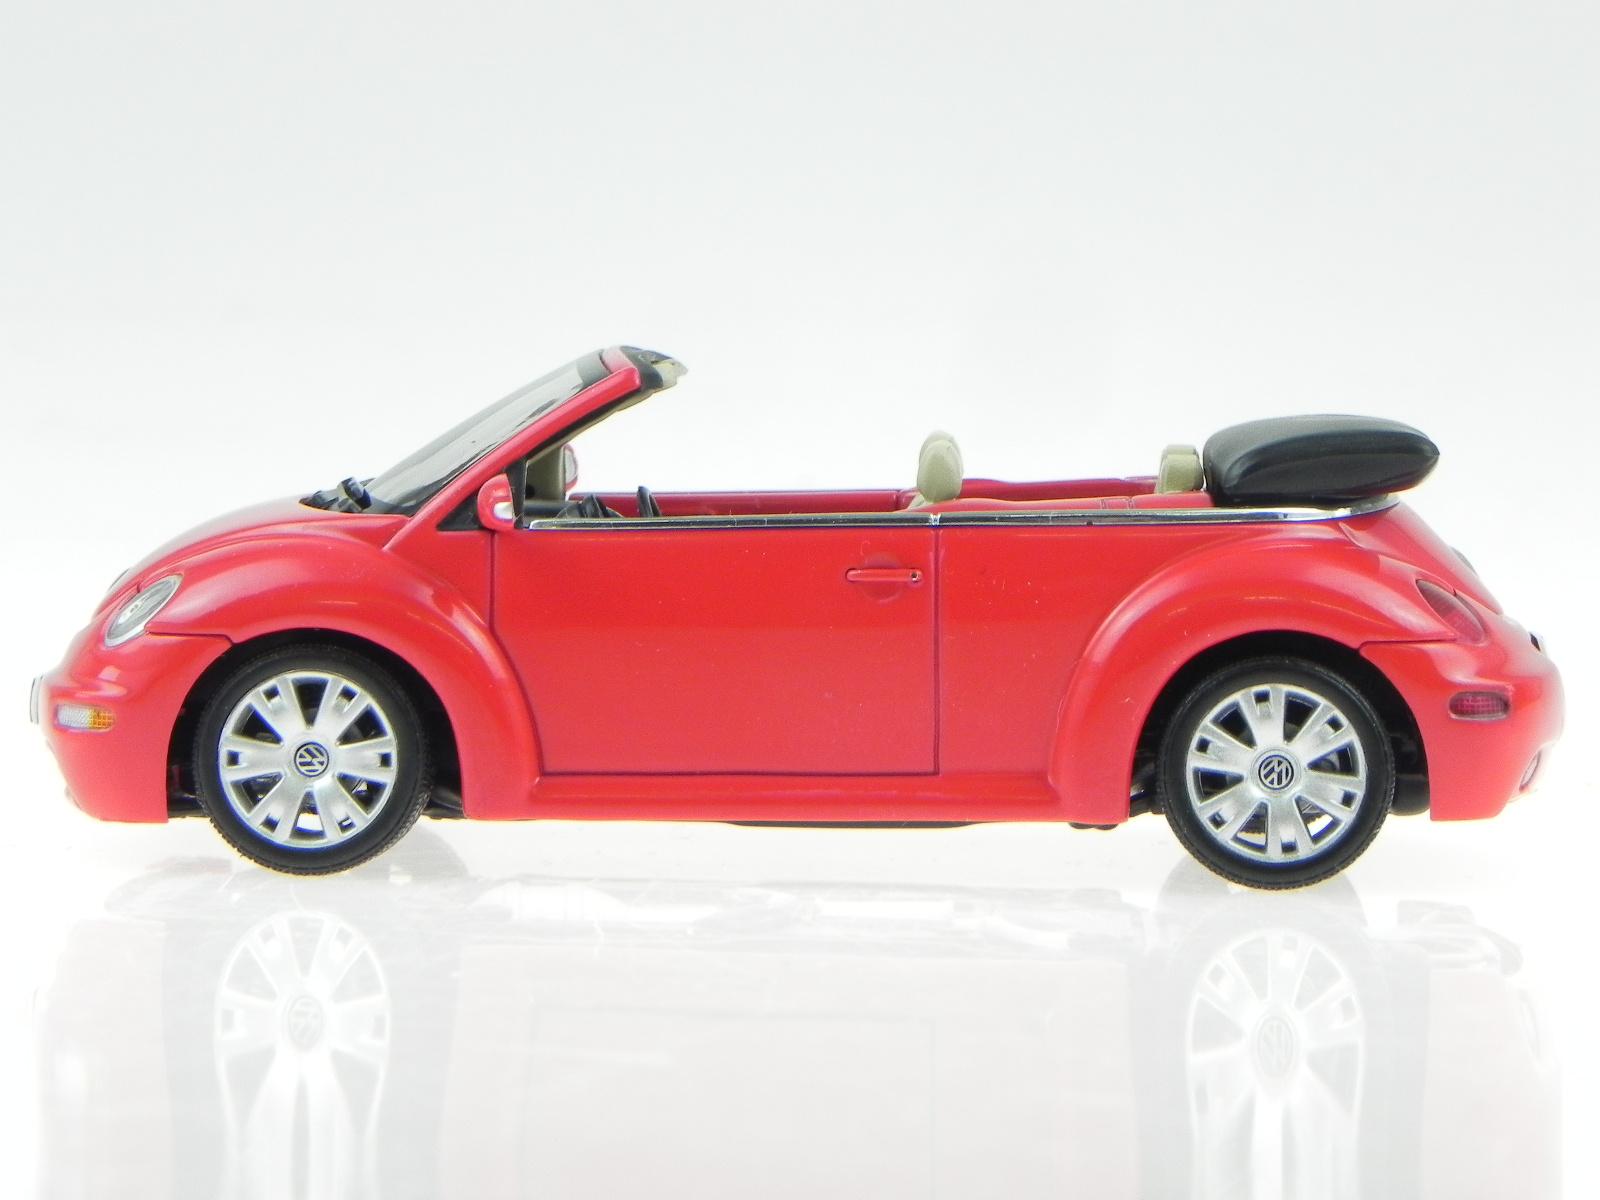 vw new beetle cabrio rot verdeck schwarz modellauto 59757. Black Bedroom Furniture Sets. Home Design Ideas